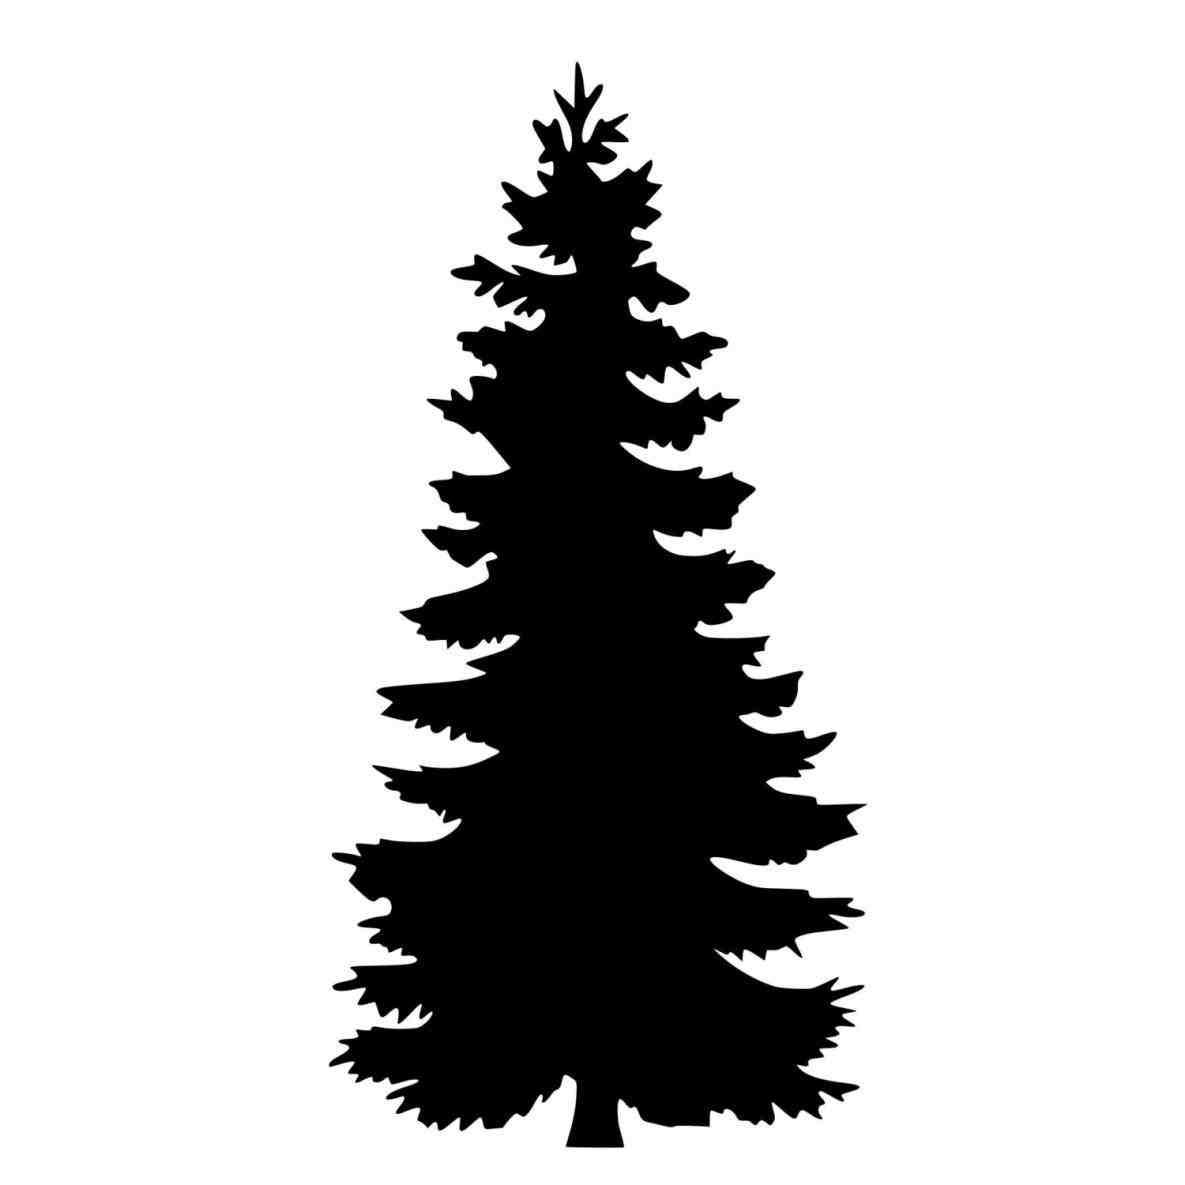 hight resolution of 1185x1185 pine tree silhouette clip art